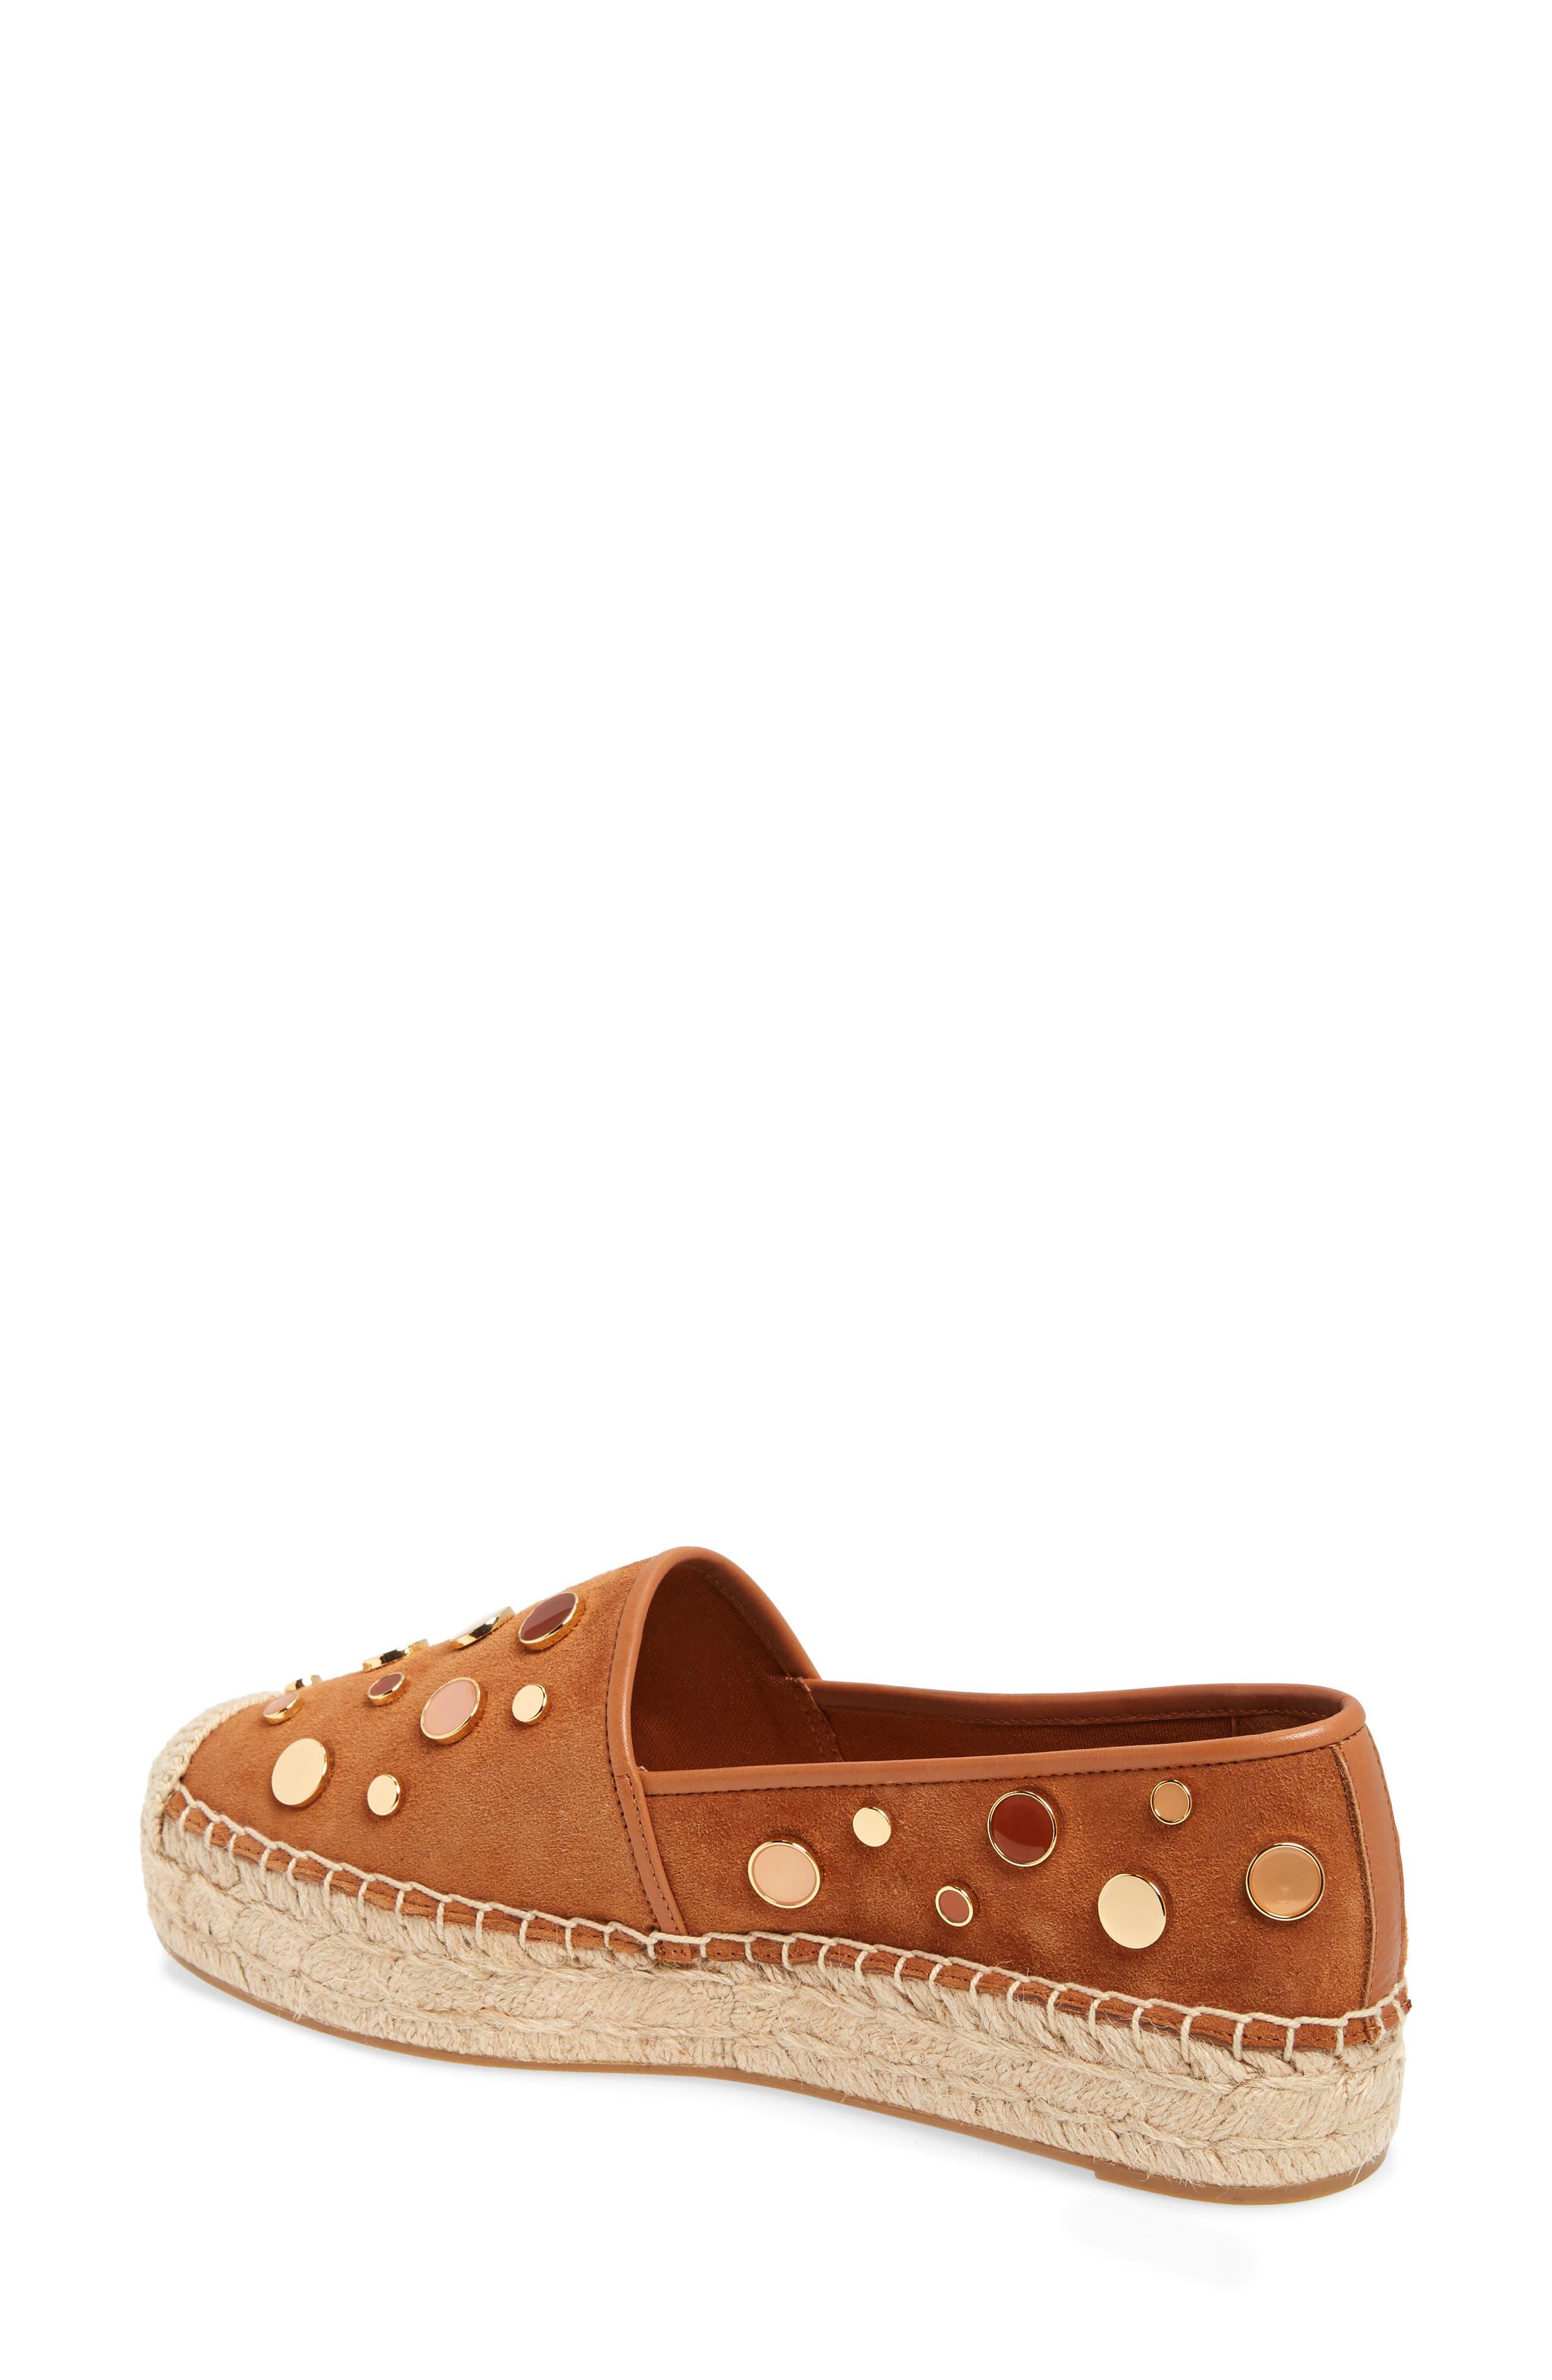 Tory Burch Shoes Suki Platform Espadrille